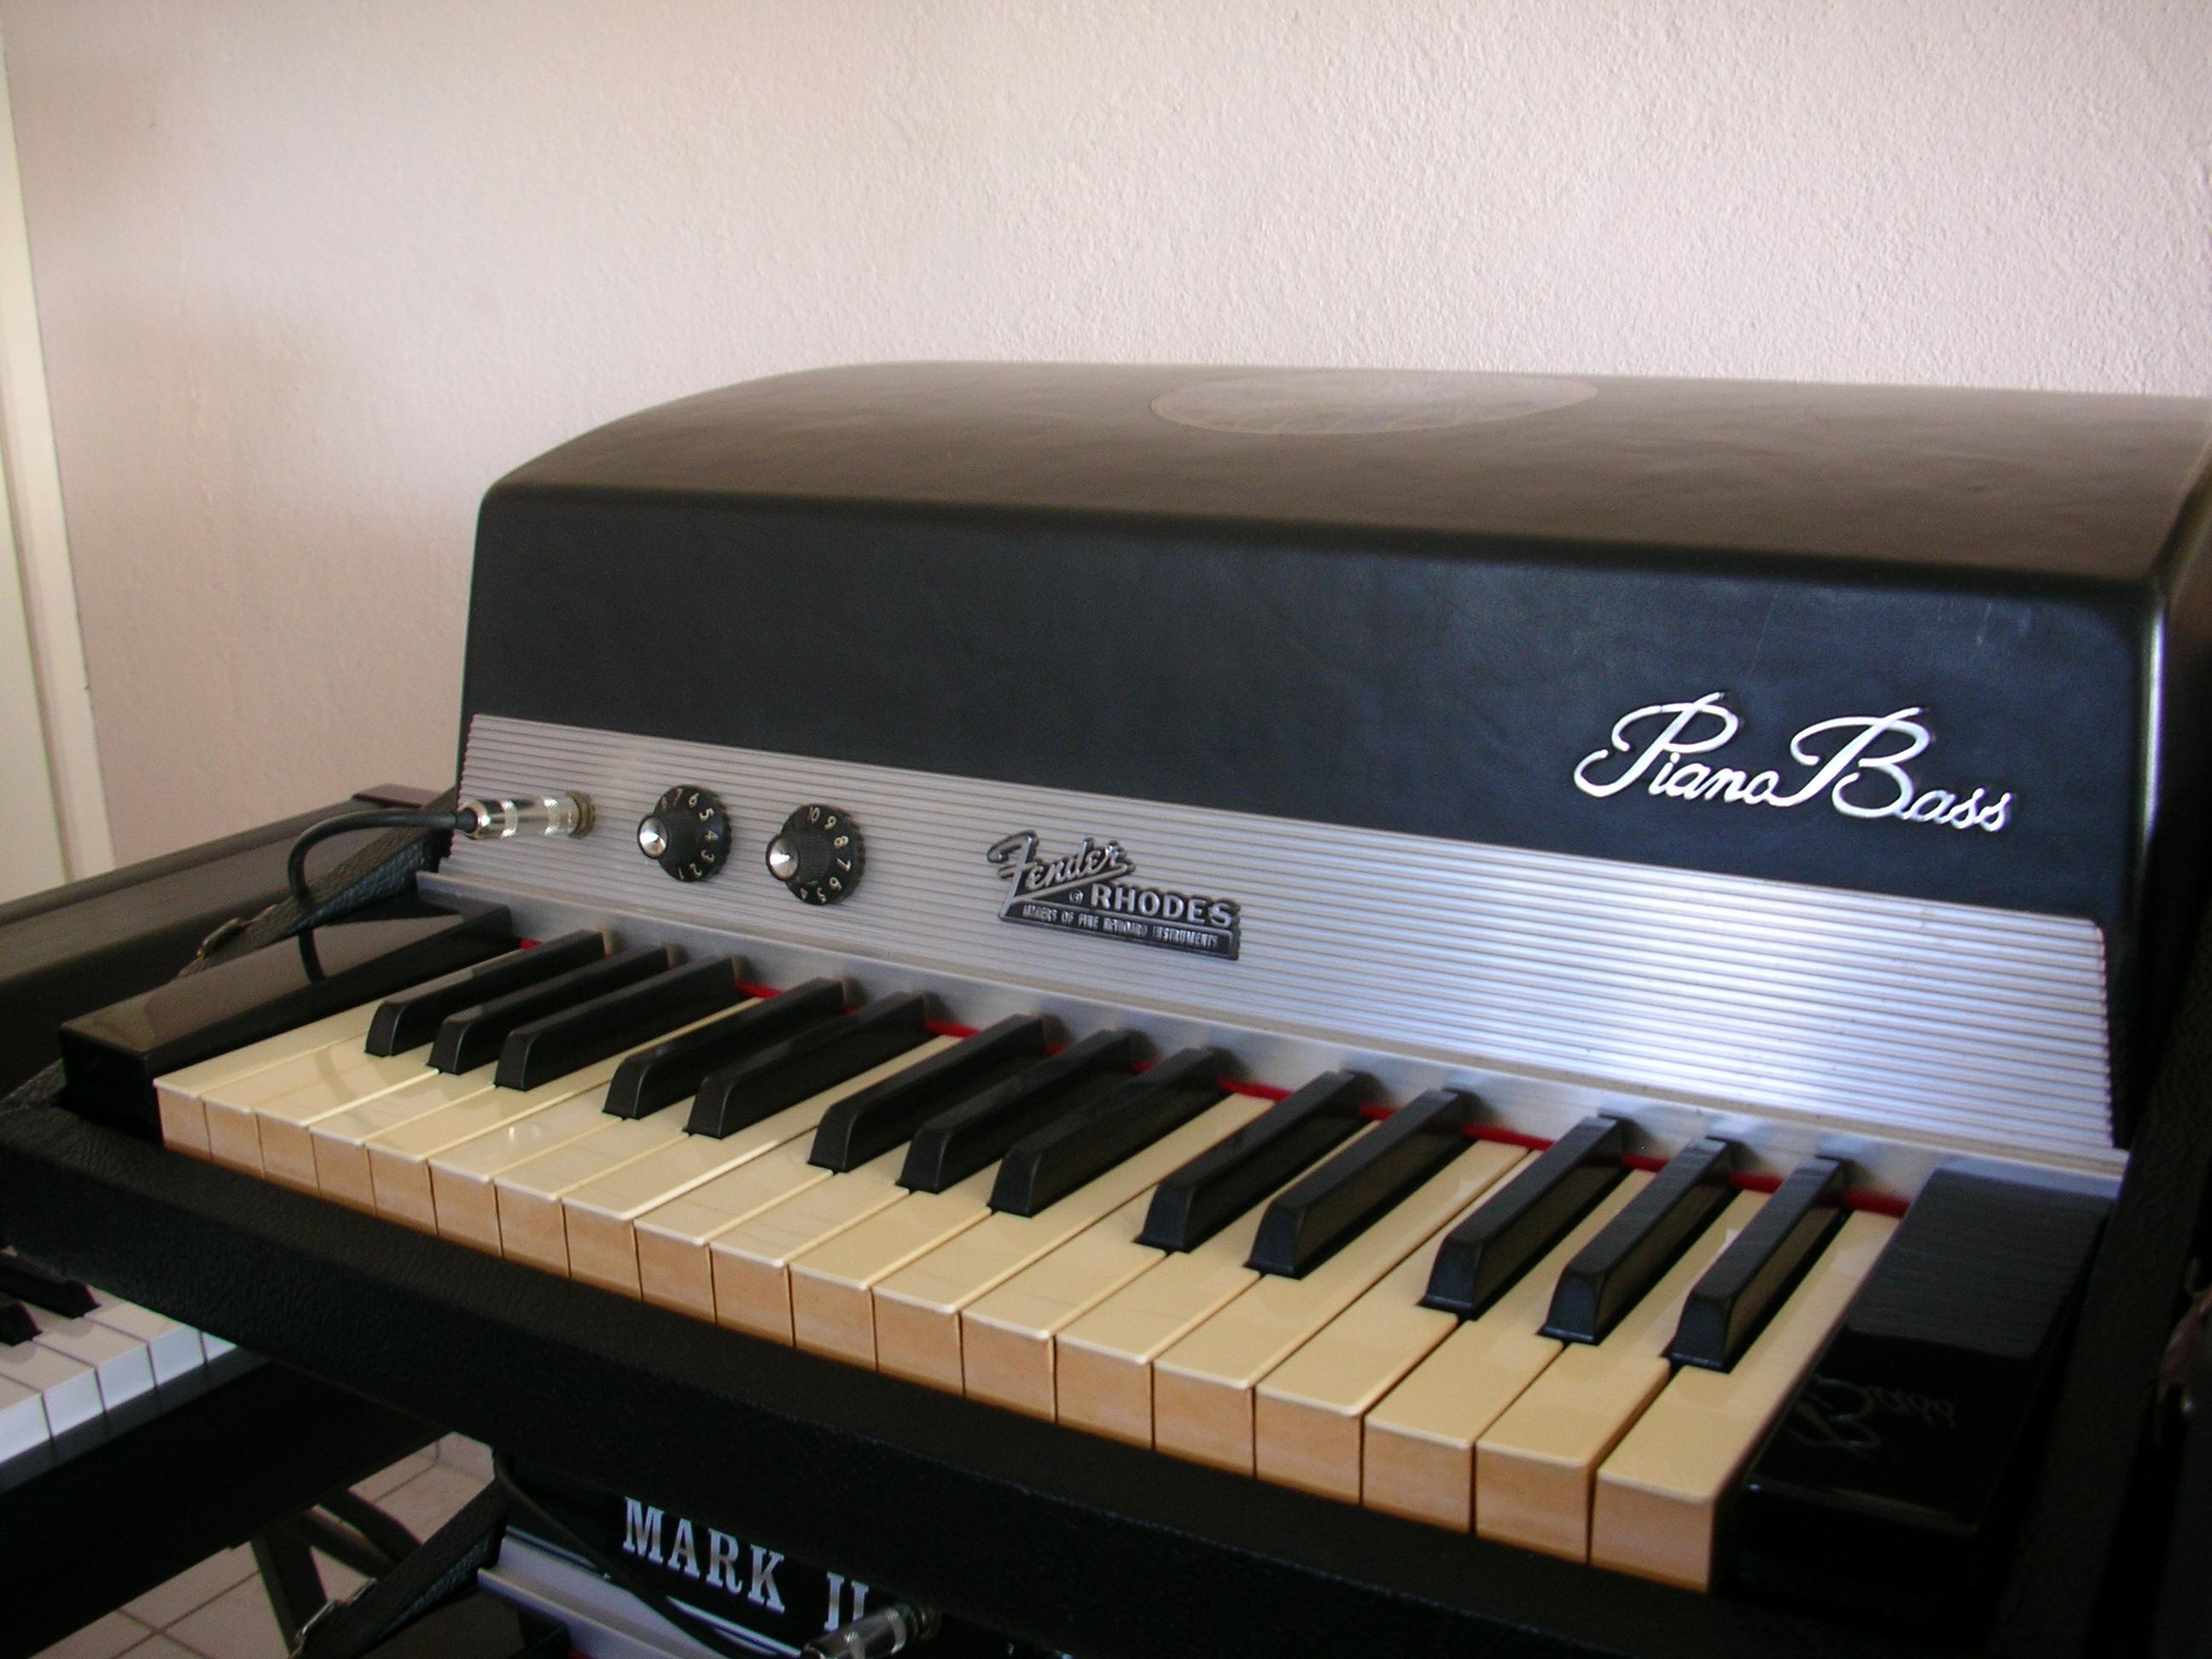 fender piano bass image 231205 audiofanzine. Black Bedroom Furniture Sets. Home Design Ideas